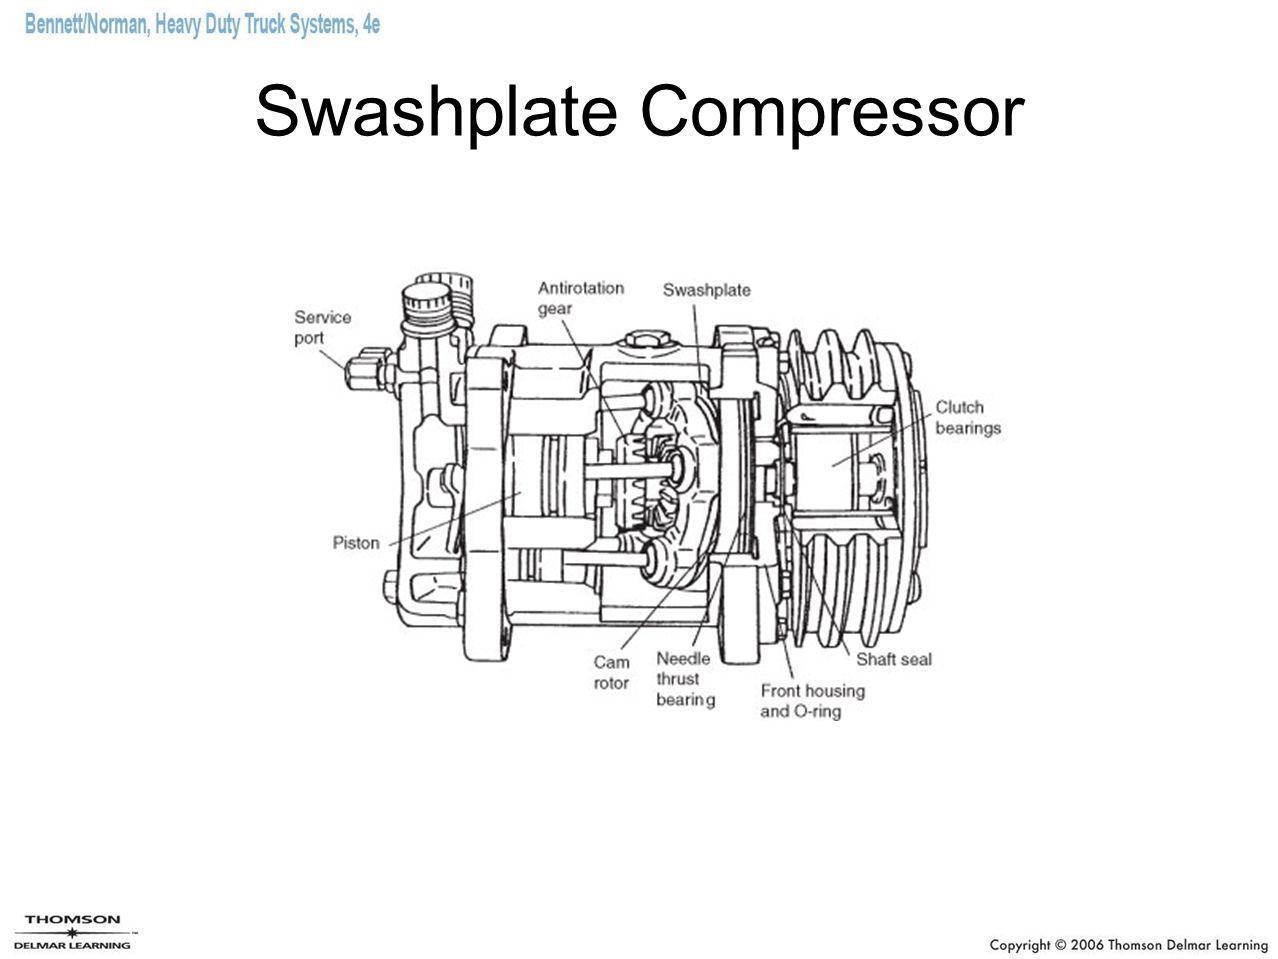 Swashplate Compressor